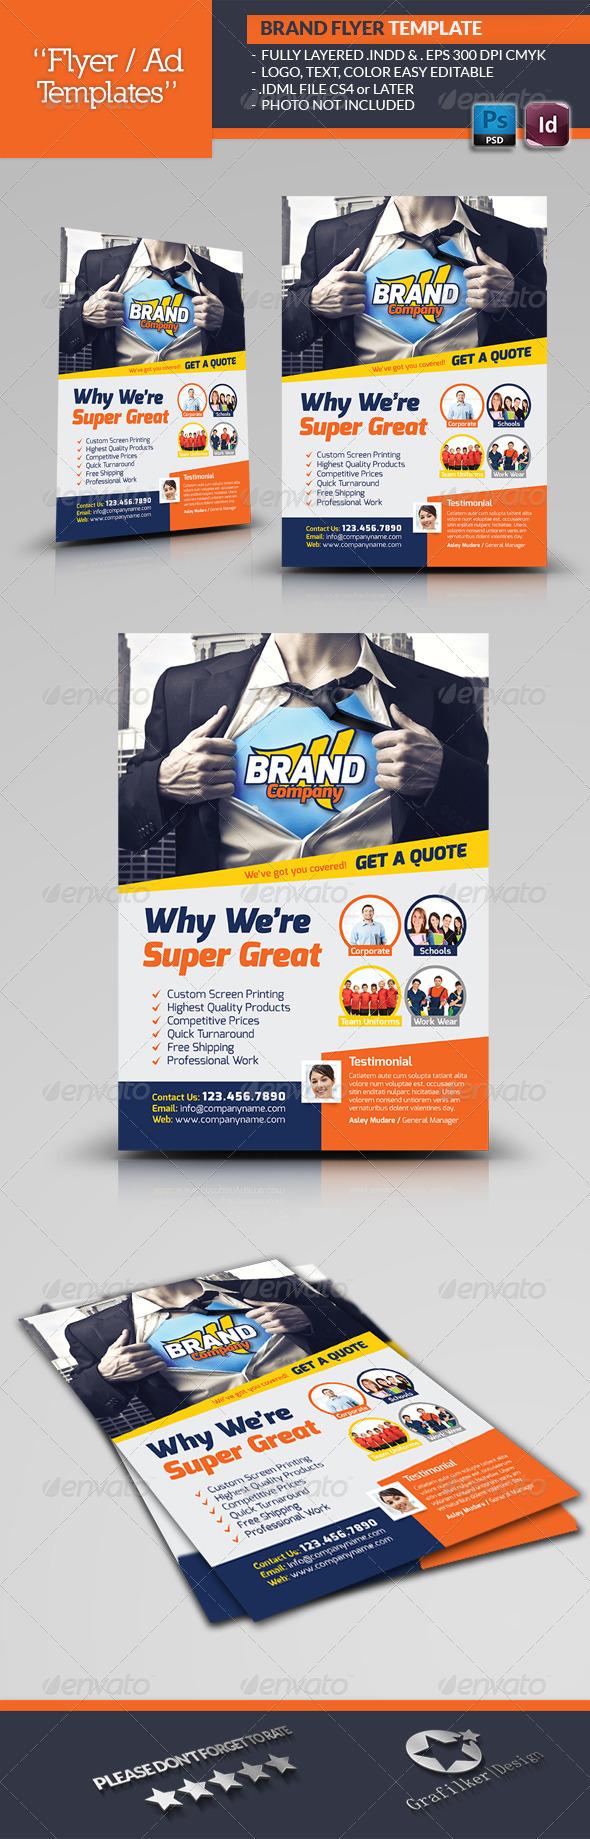 GraphicRiver Creative Brand Flyer Template 6641740